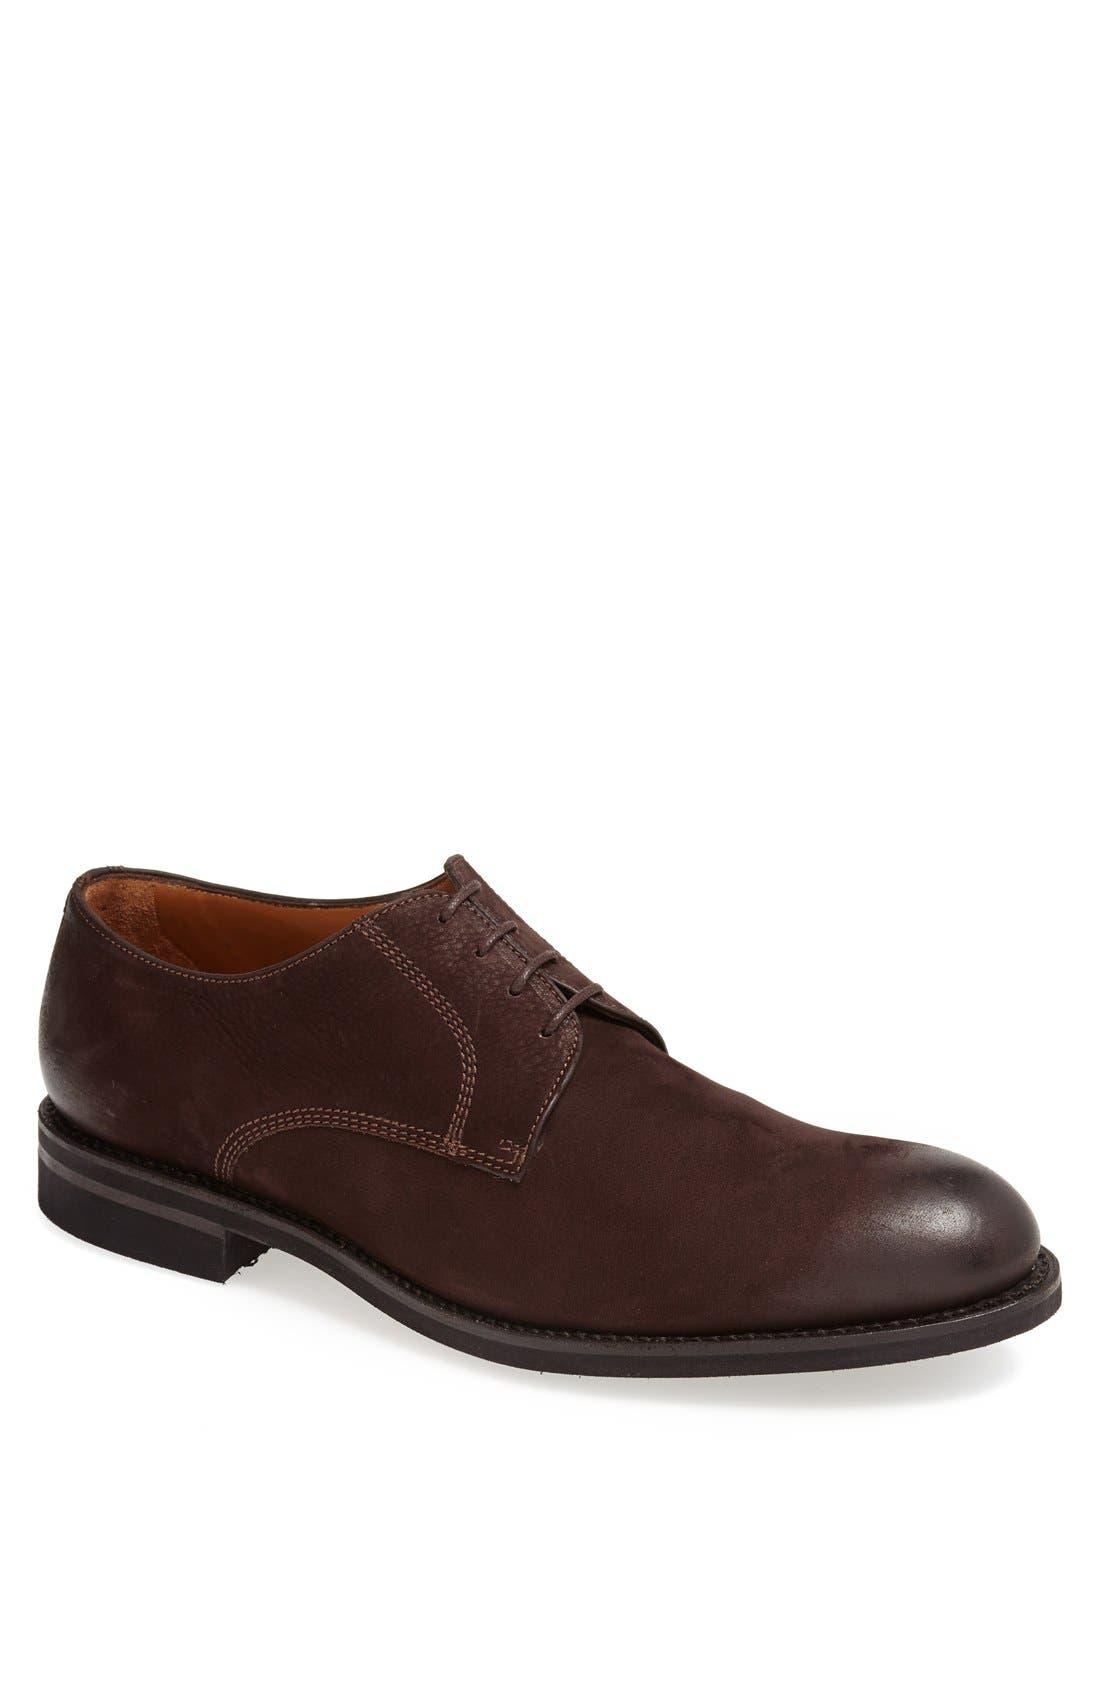 Alternate Image 1 Selected - Lottusse Leather Plain Toe Derby